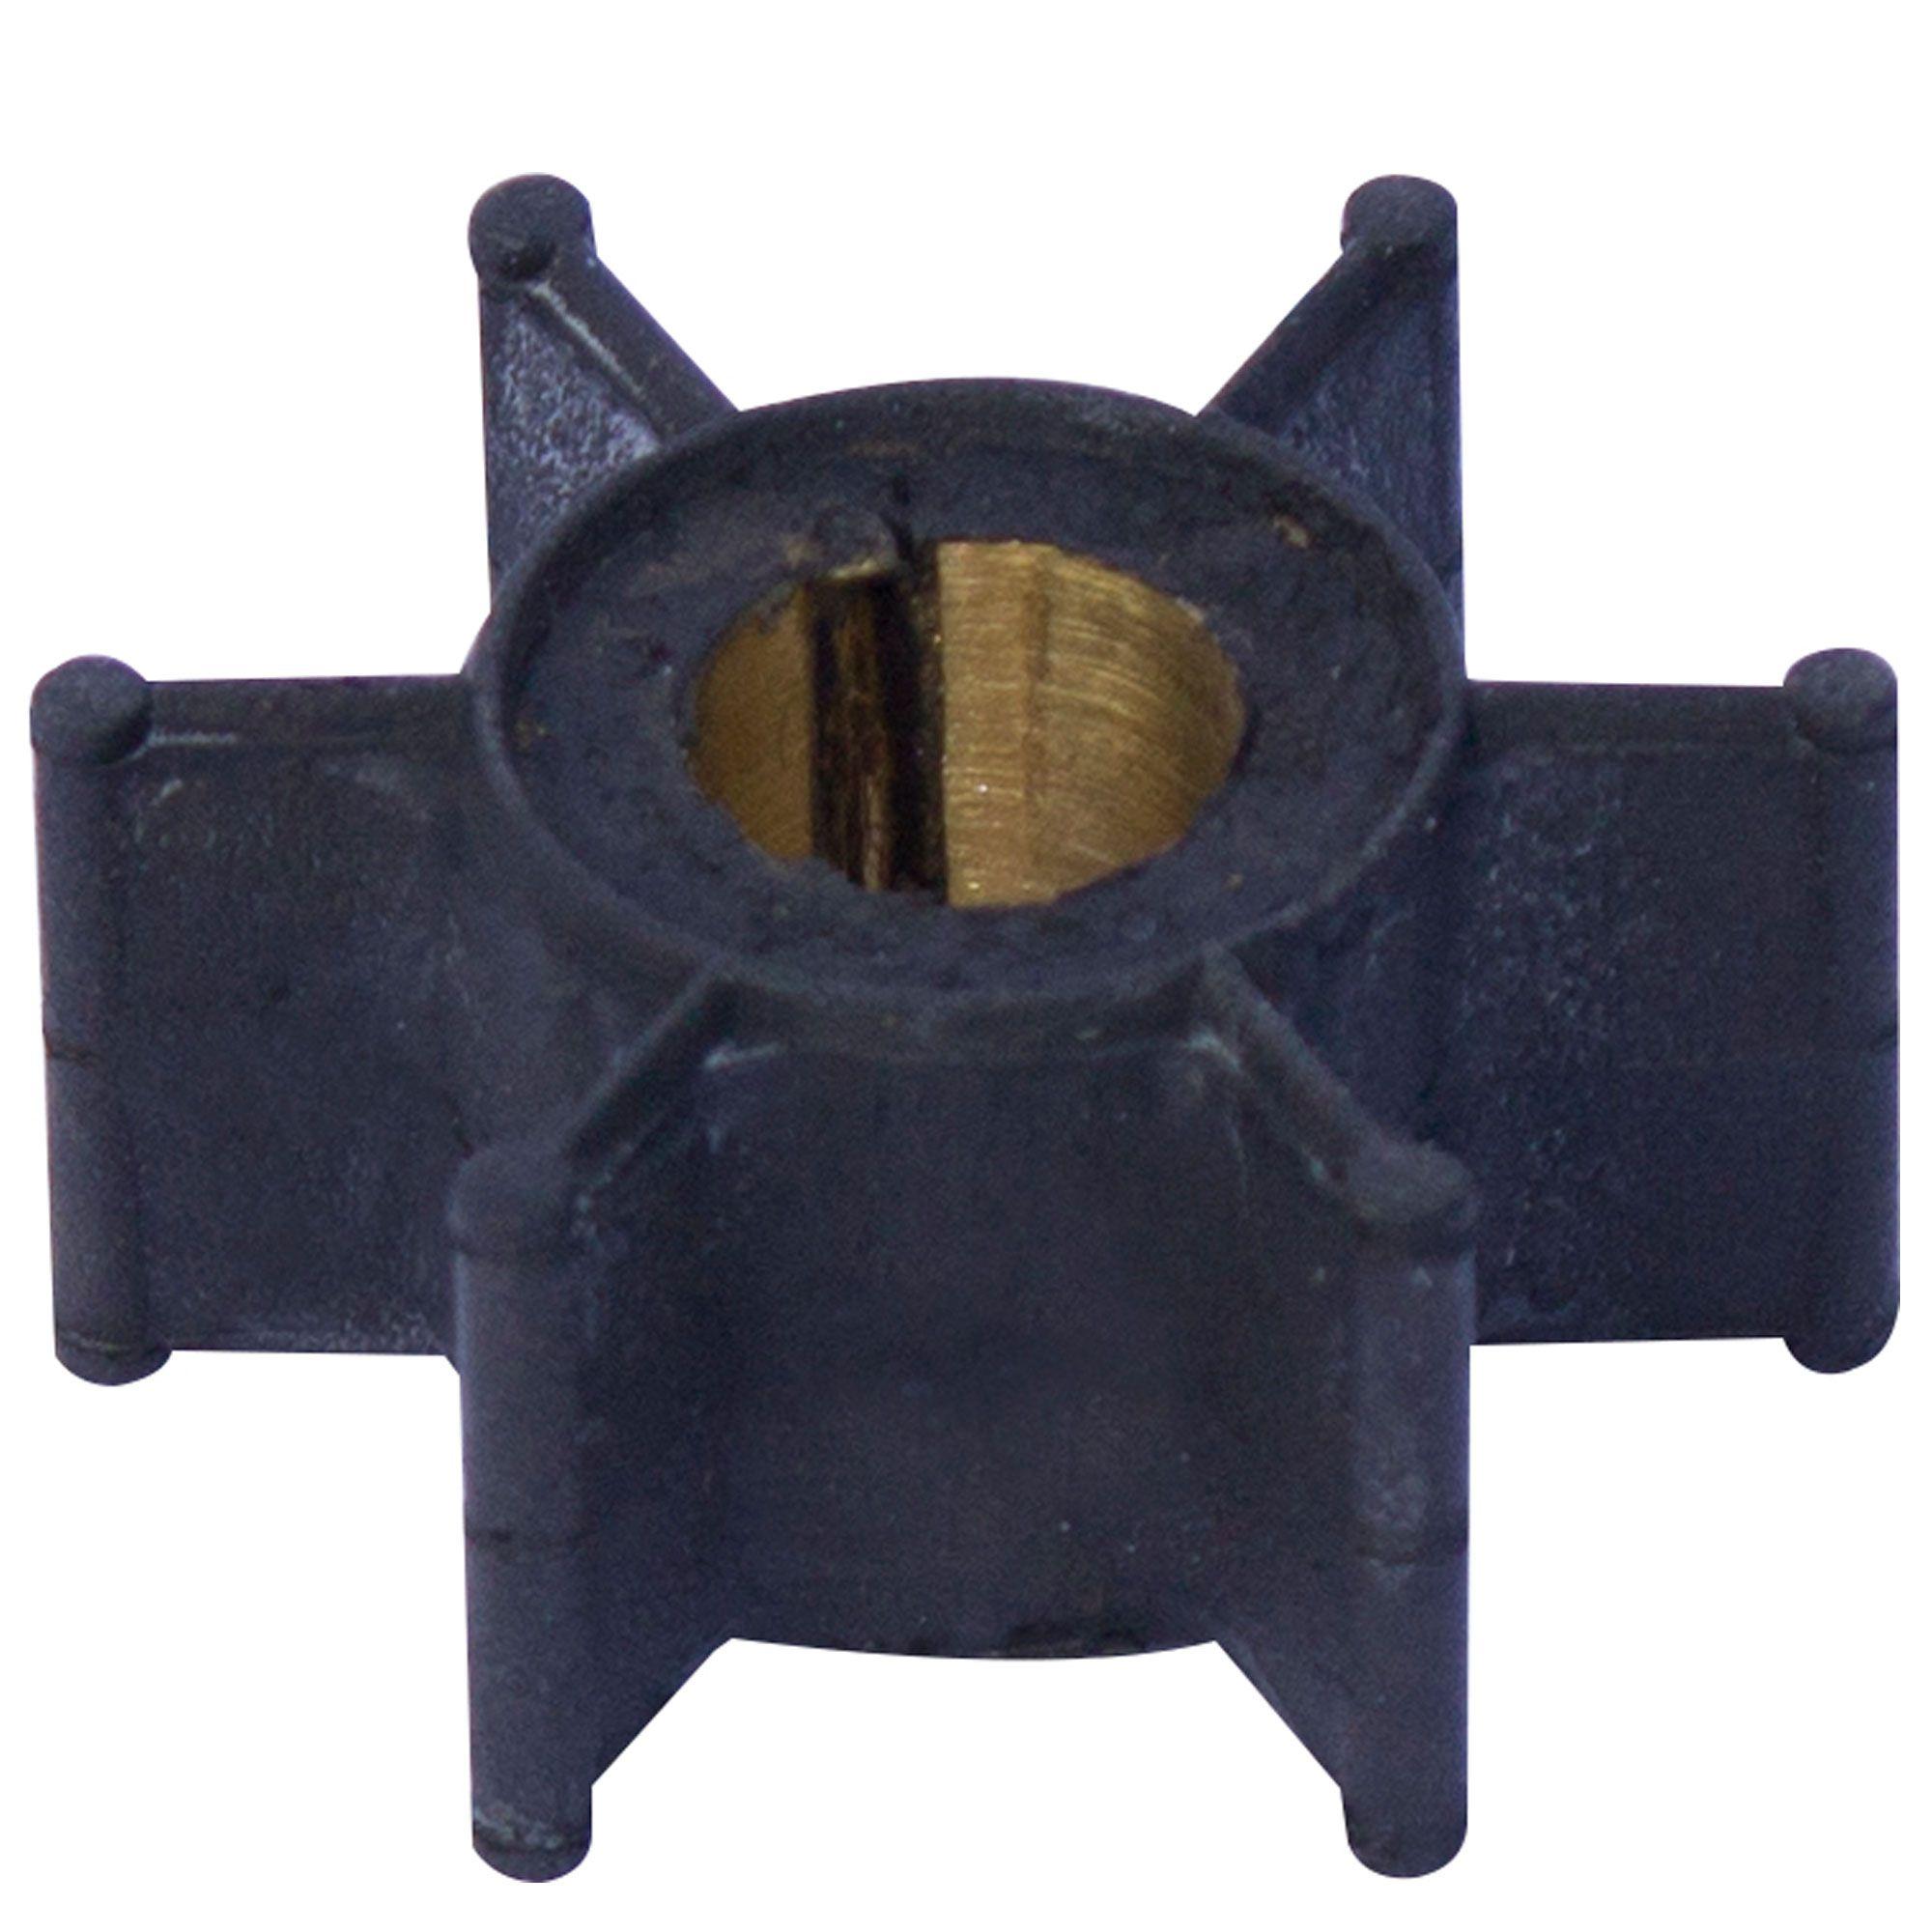 Rotor 60 x 13 x 22mm